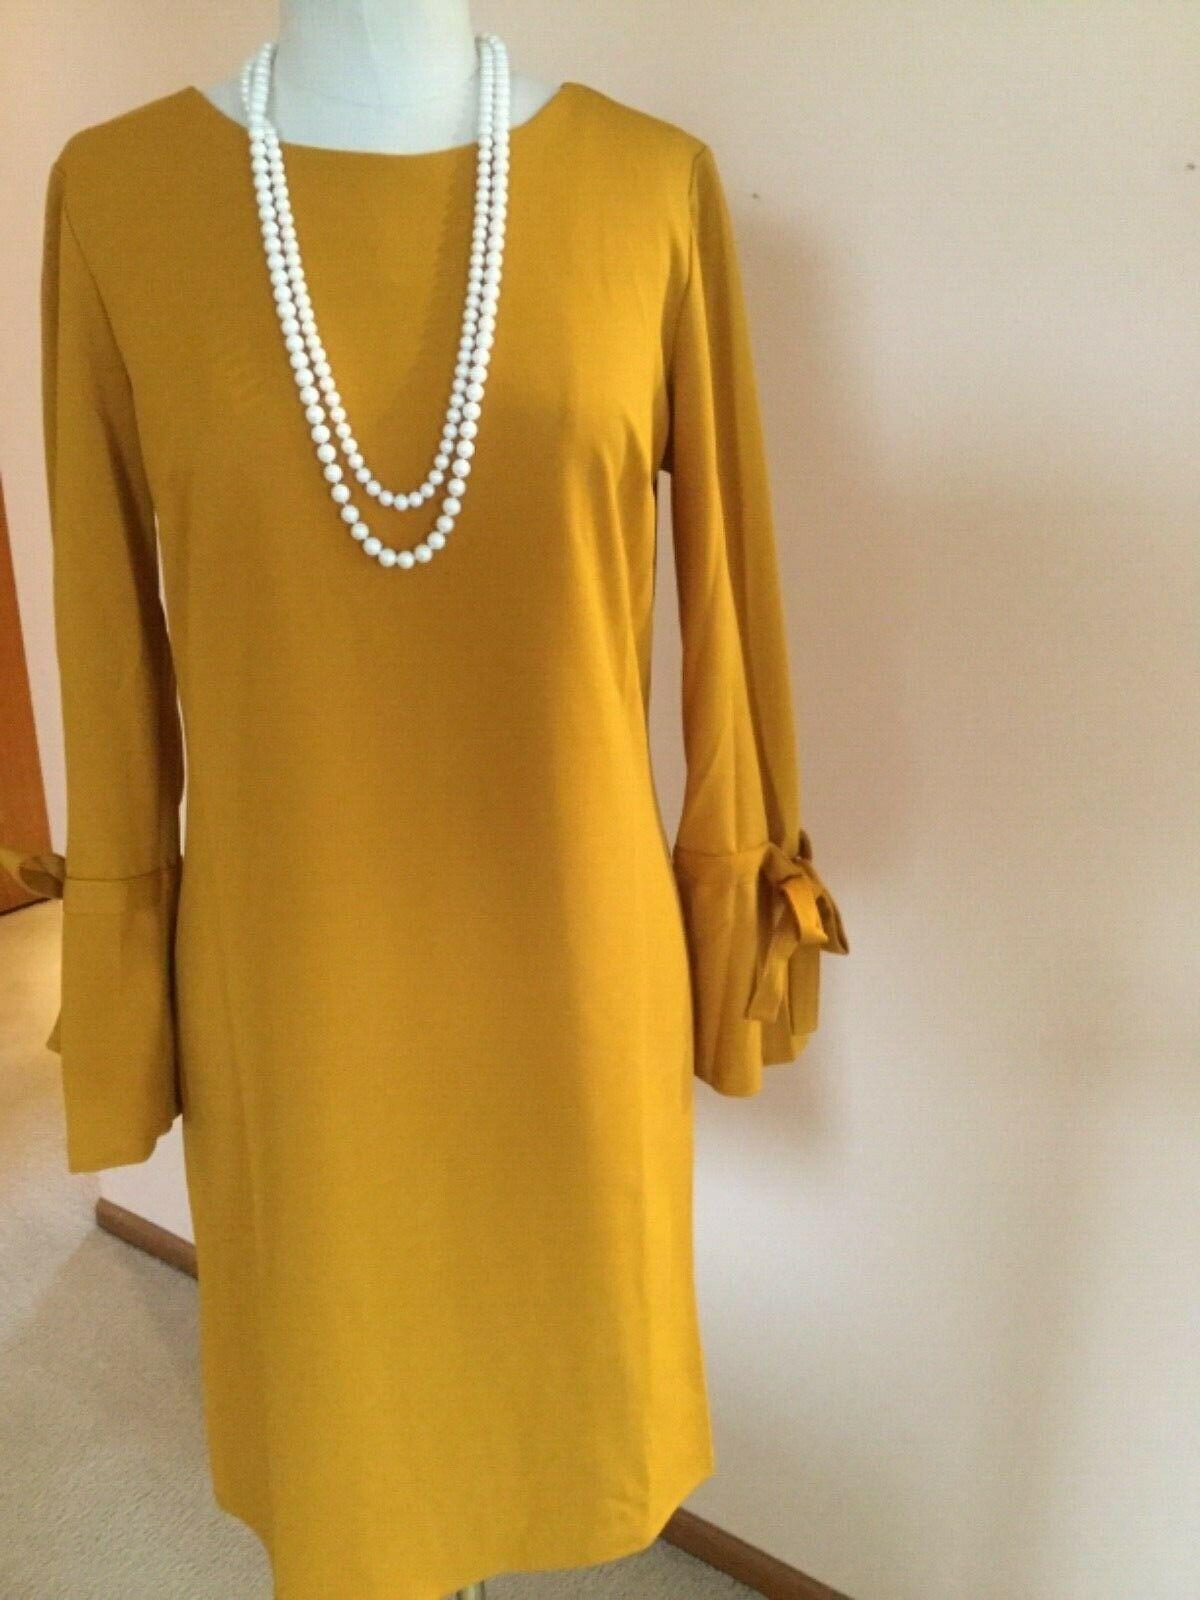 Women's Dress,XL,Yellow,Long Sleeves ,Armani Collezioni,NWOT